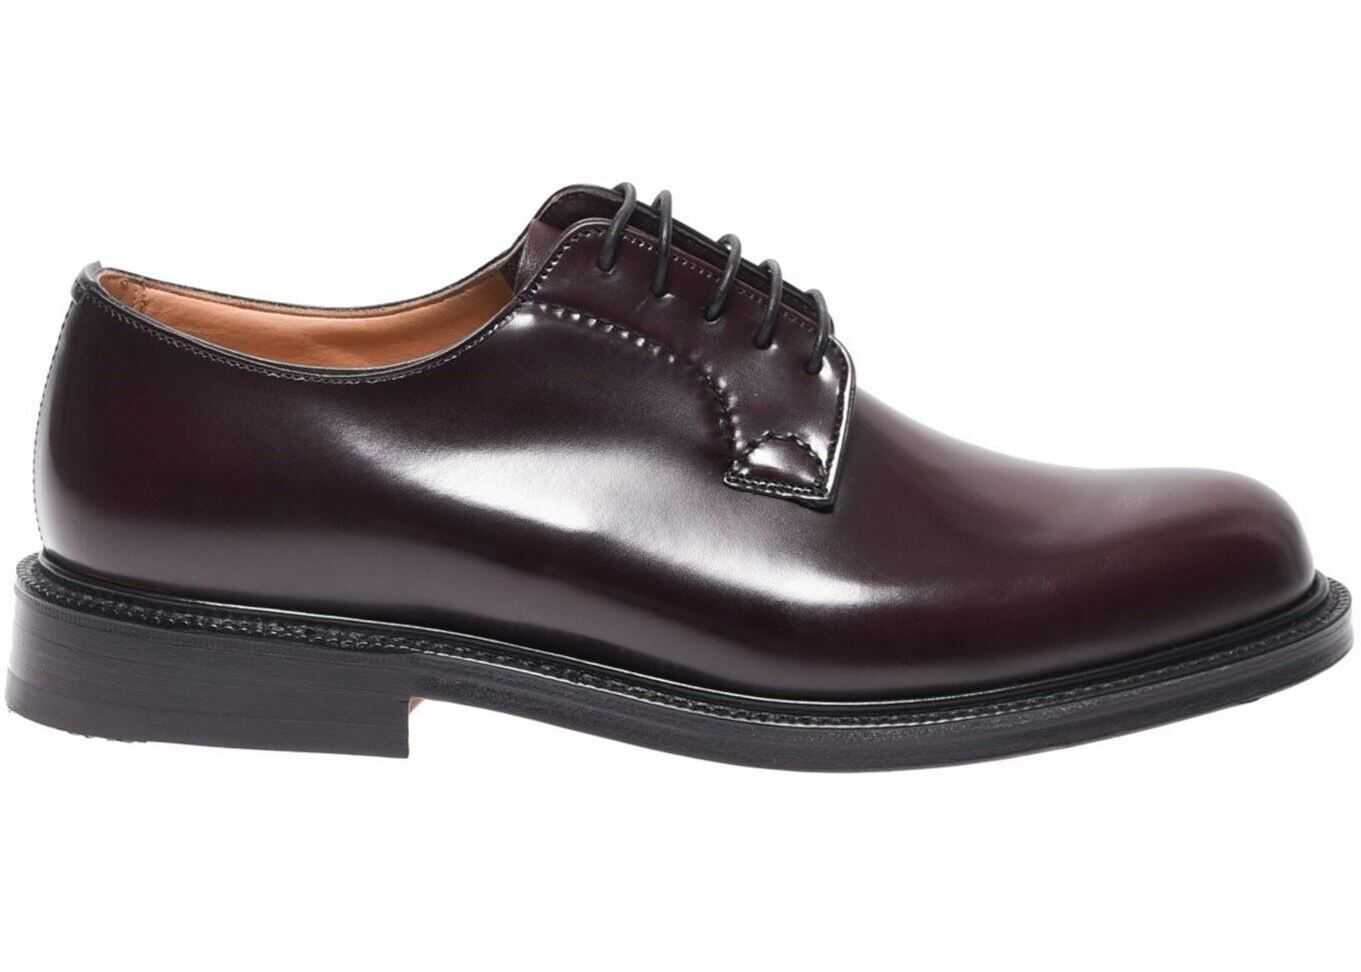 Church's Shannon Glossy Burgundy Leather Derby Shoes EEB001 9XV F0ADY Red imagine b-mall.ro